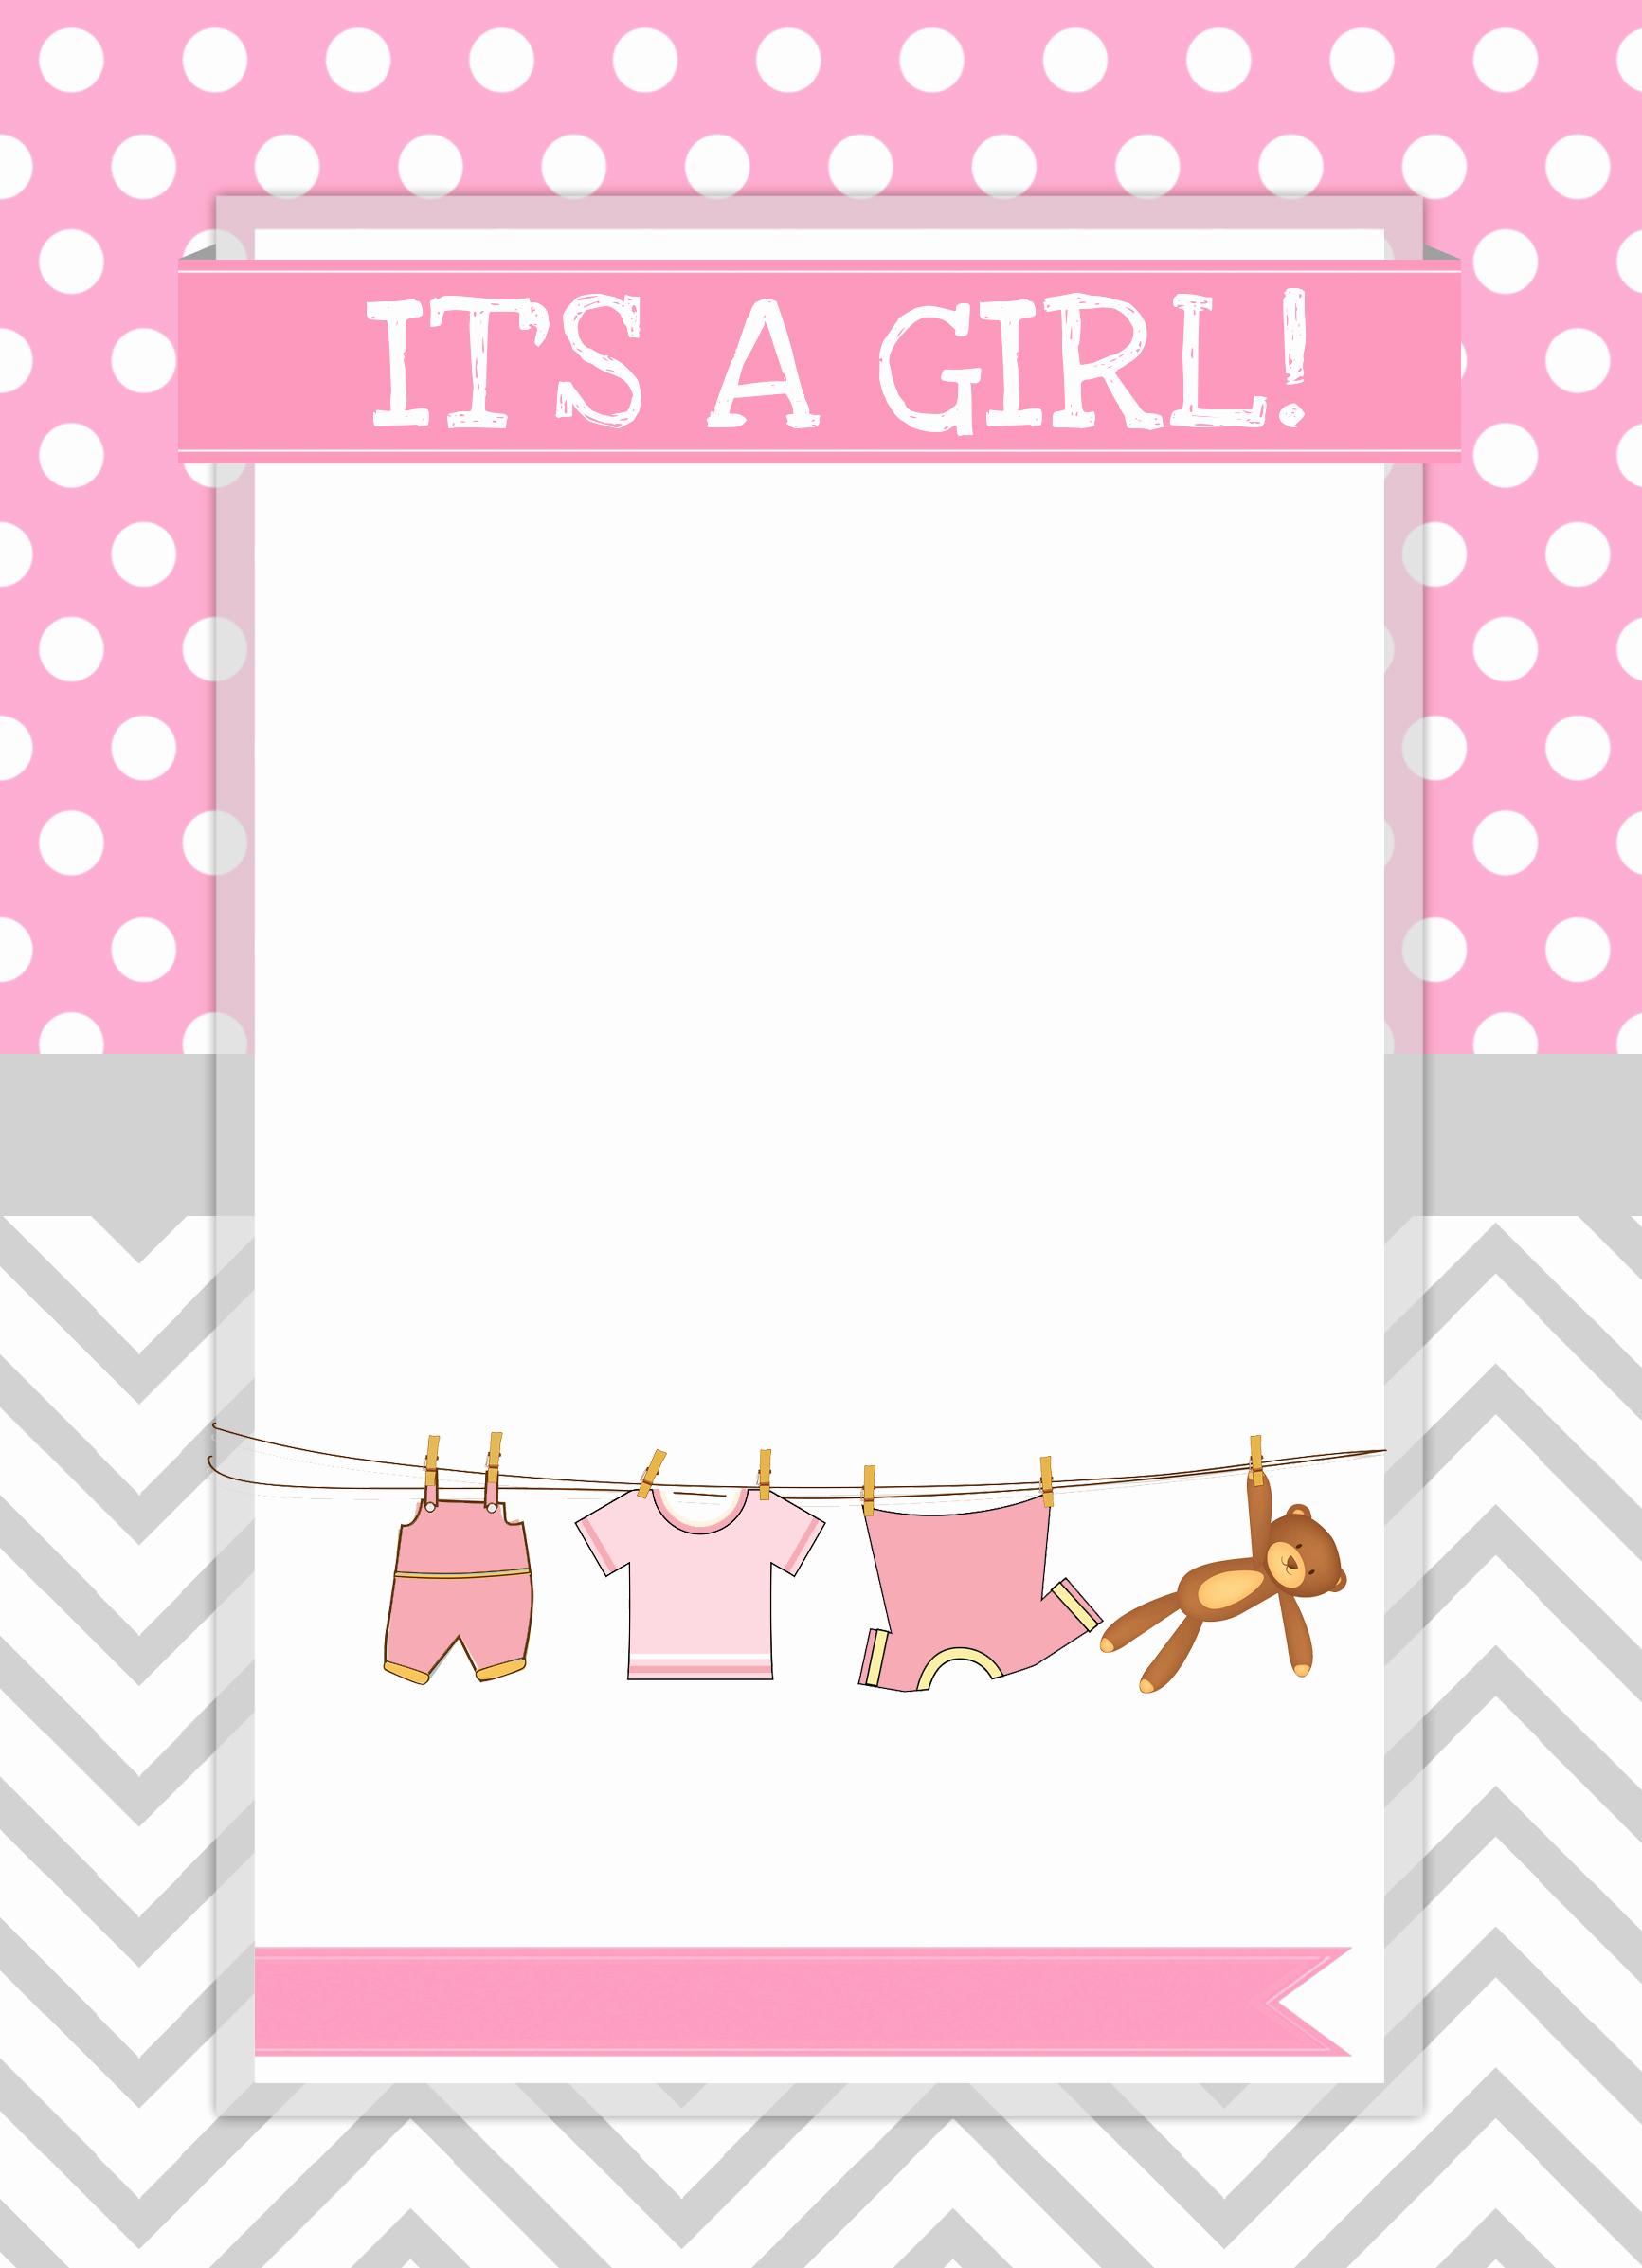 Girl Baby Shower Invitation Templates Fresh Baby Girl Shower Free Printables How to Nest for Less™